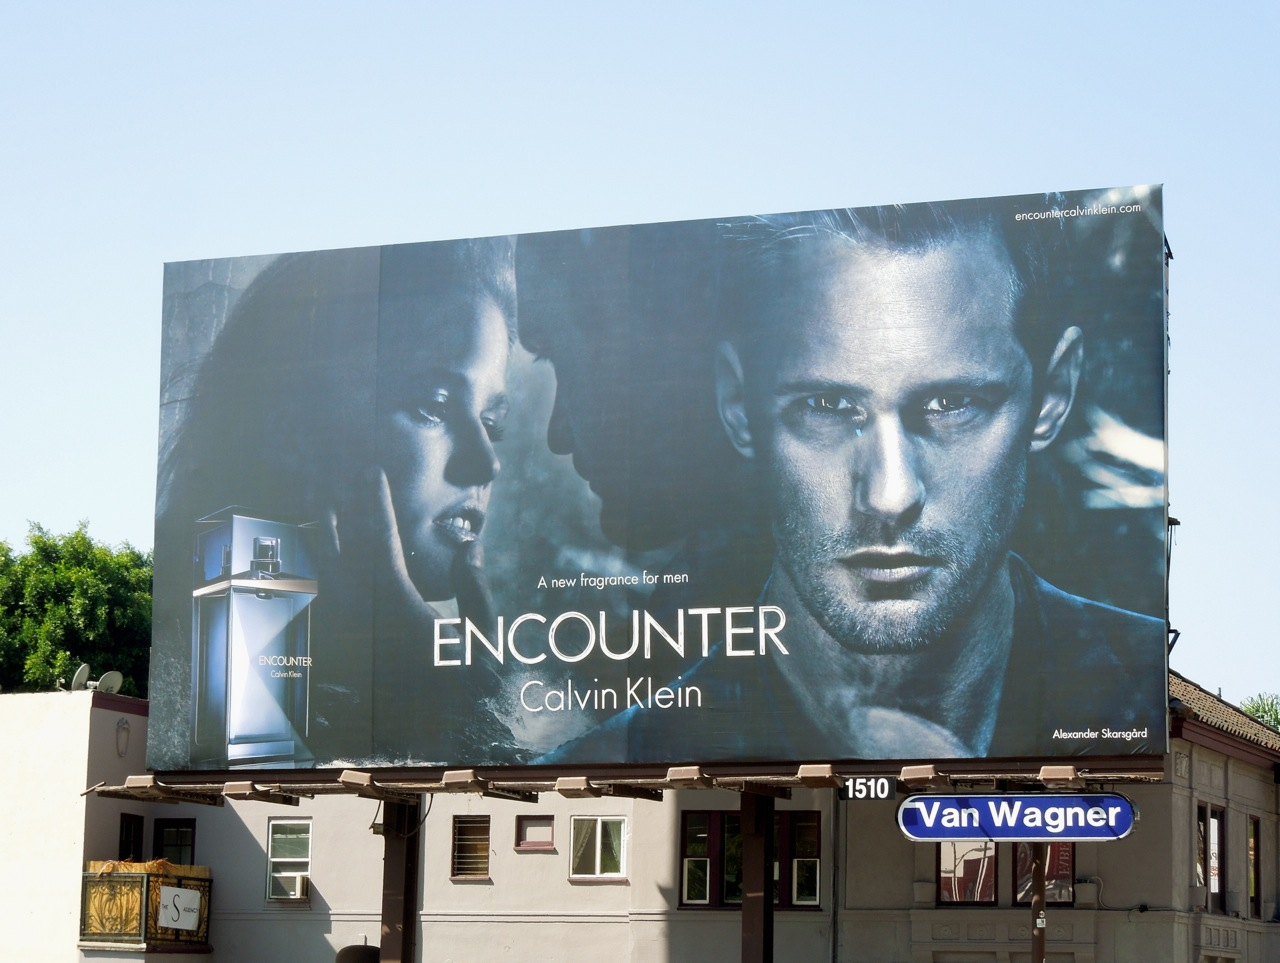 http://1.bp.blogspot.com/--YaJF_6MvBU/UGJIGtV1mmI/AAAAAAAA01k/-_ZwprX4jZE/s1600/skarsgard+ck+encounter+billboard.jpg